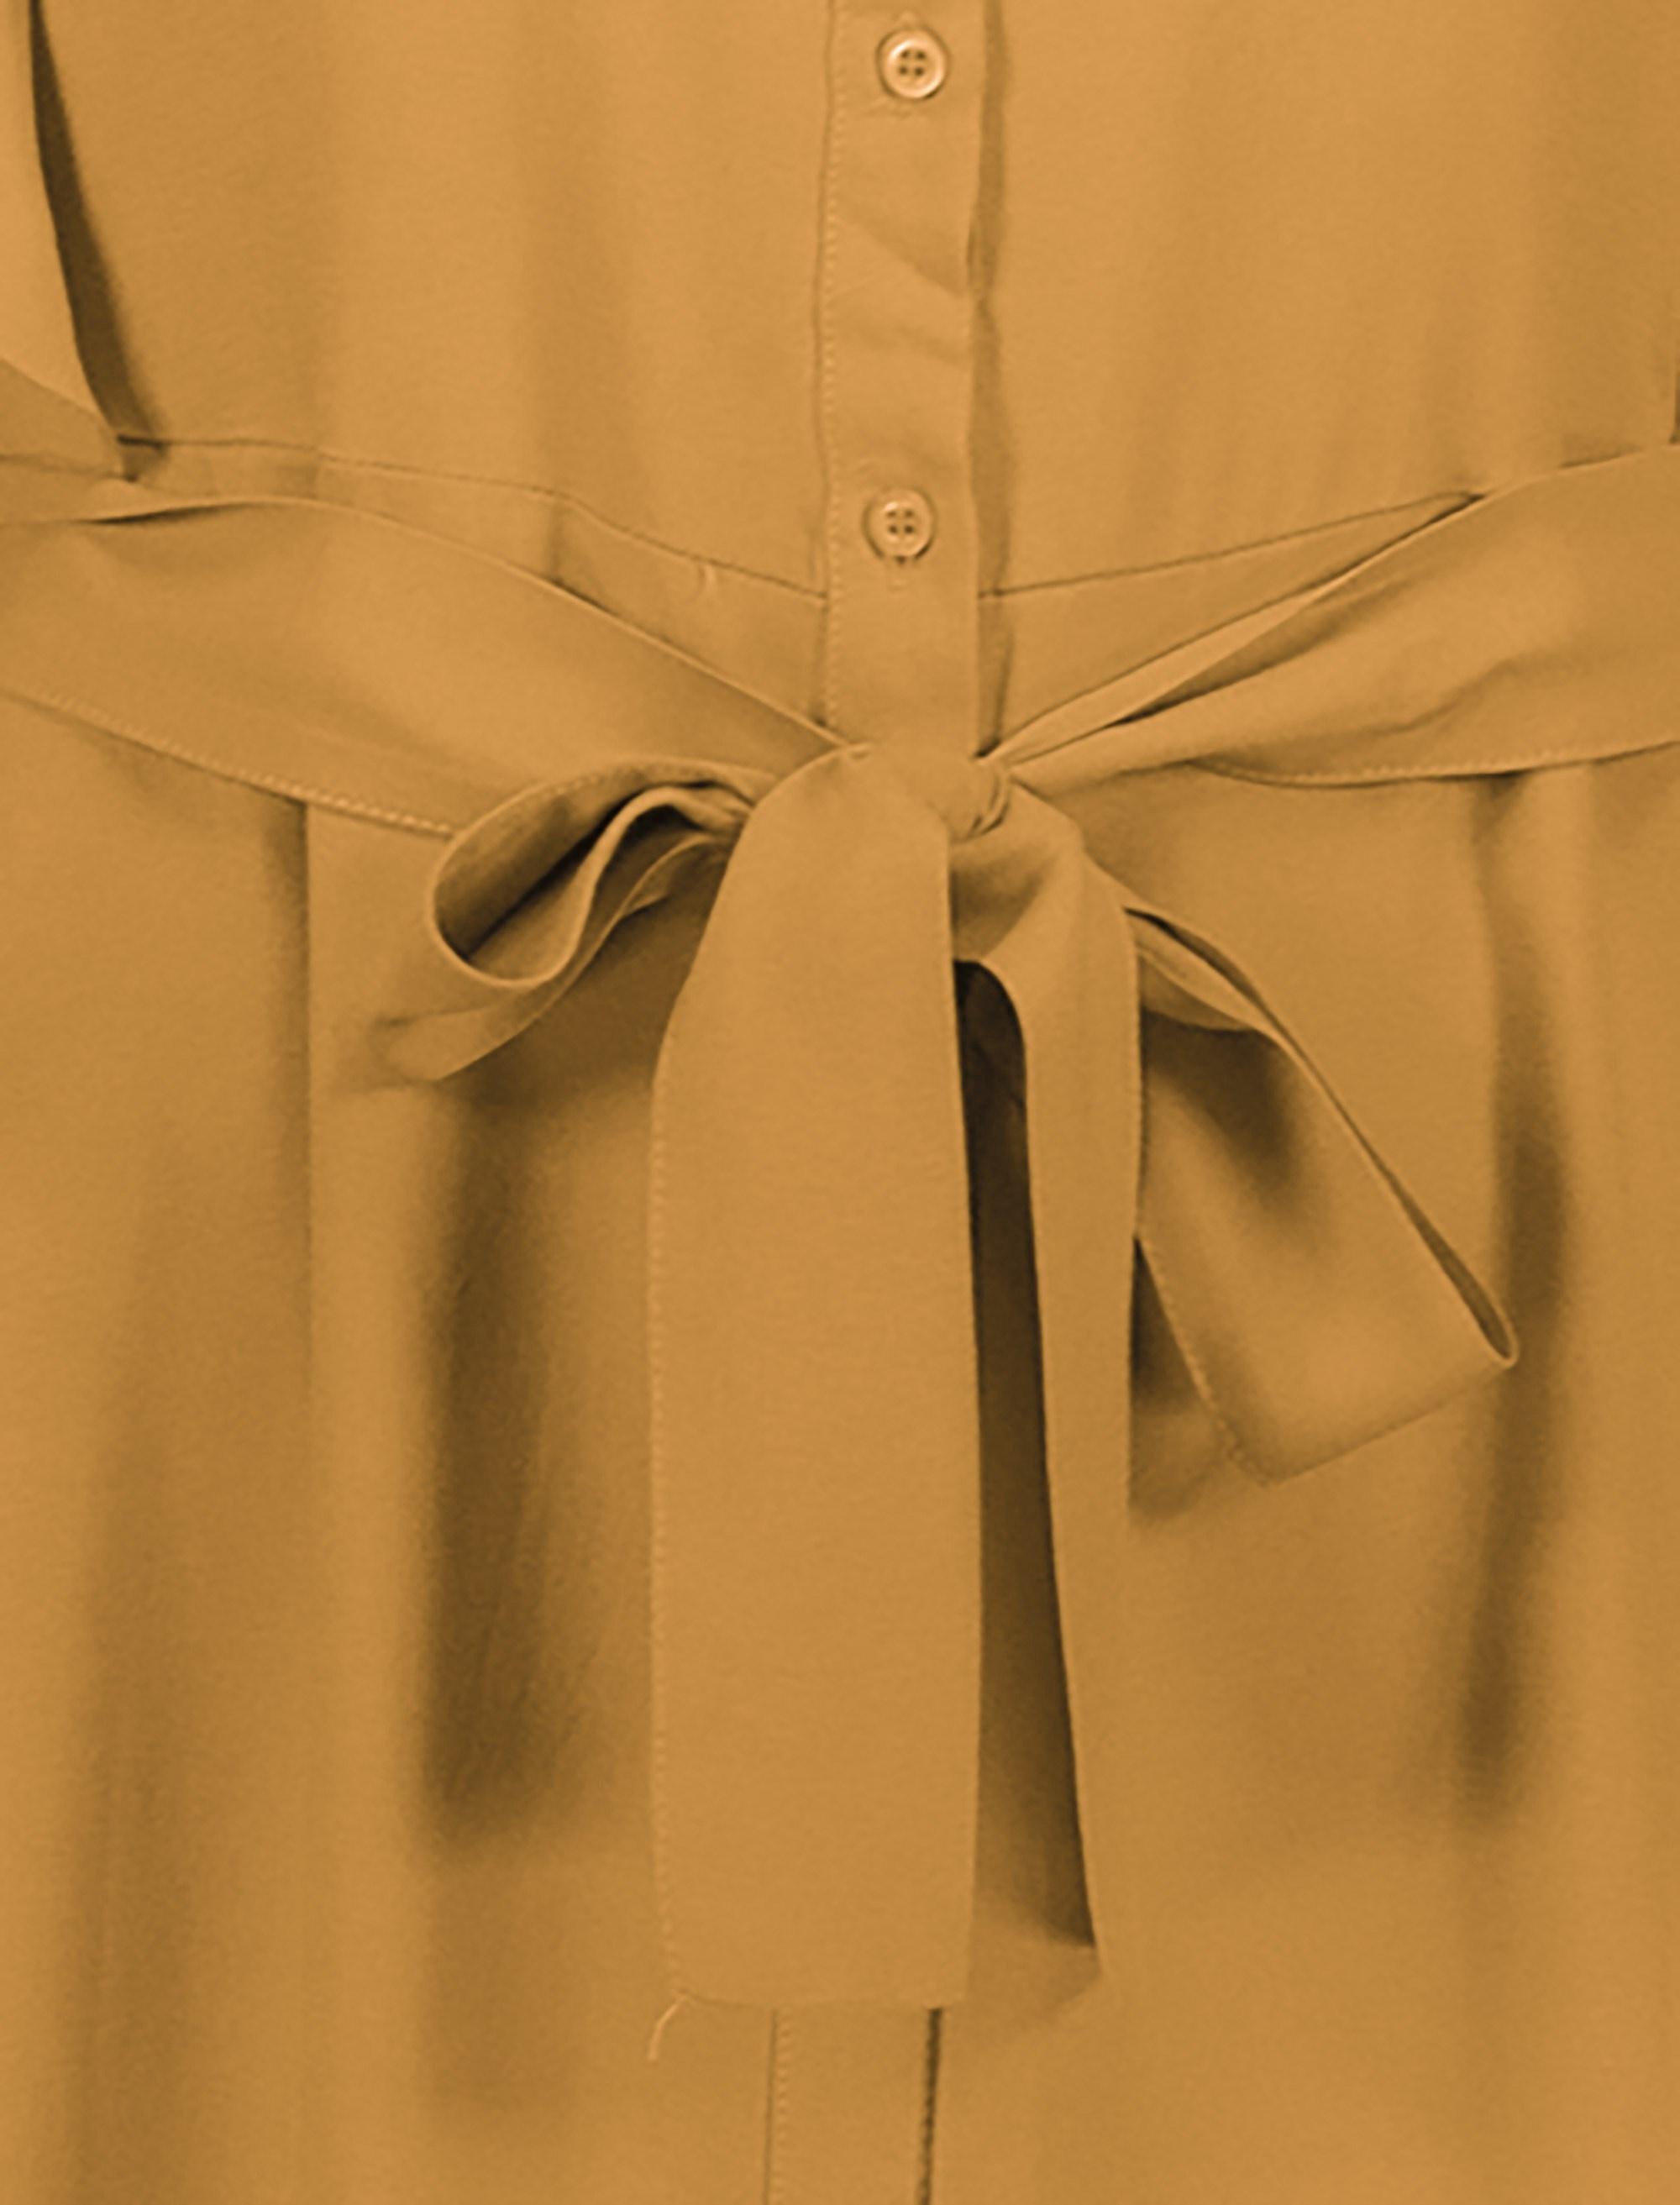 پیراهن ویسکوز بلند زنانه - کوتون - نارنجي - 4